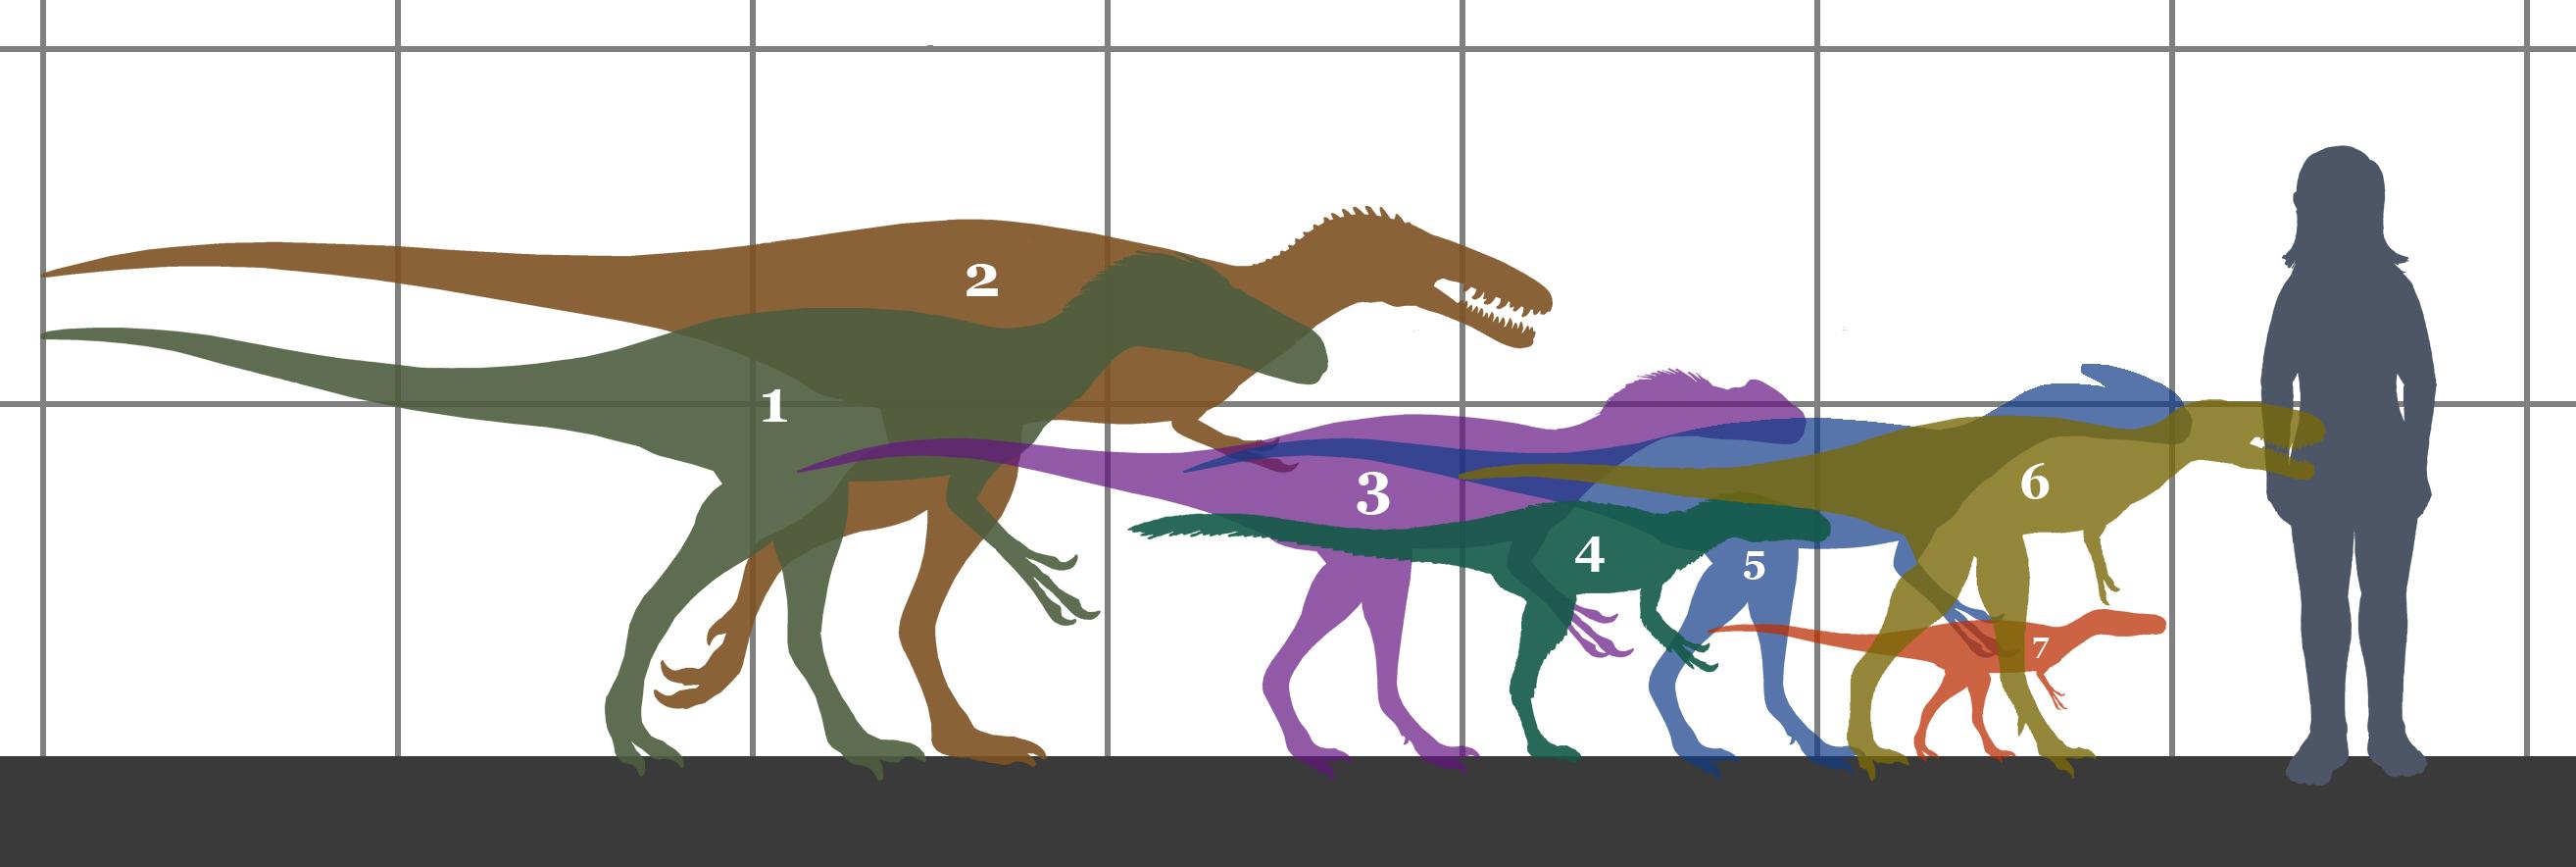 File:Tyrannosauroidea size 01.jpg - Wikimedia Commons